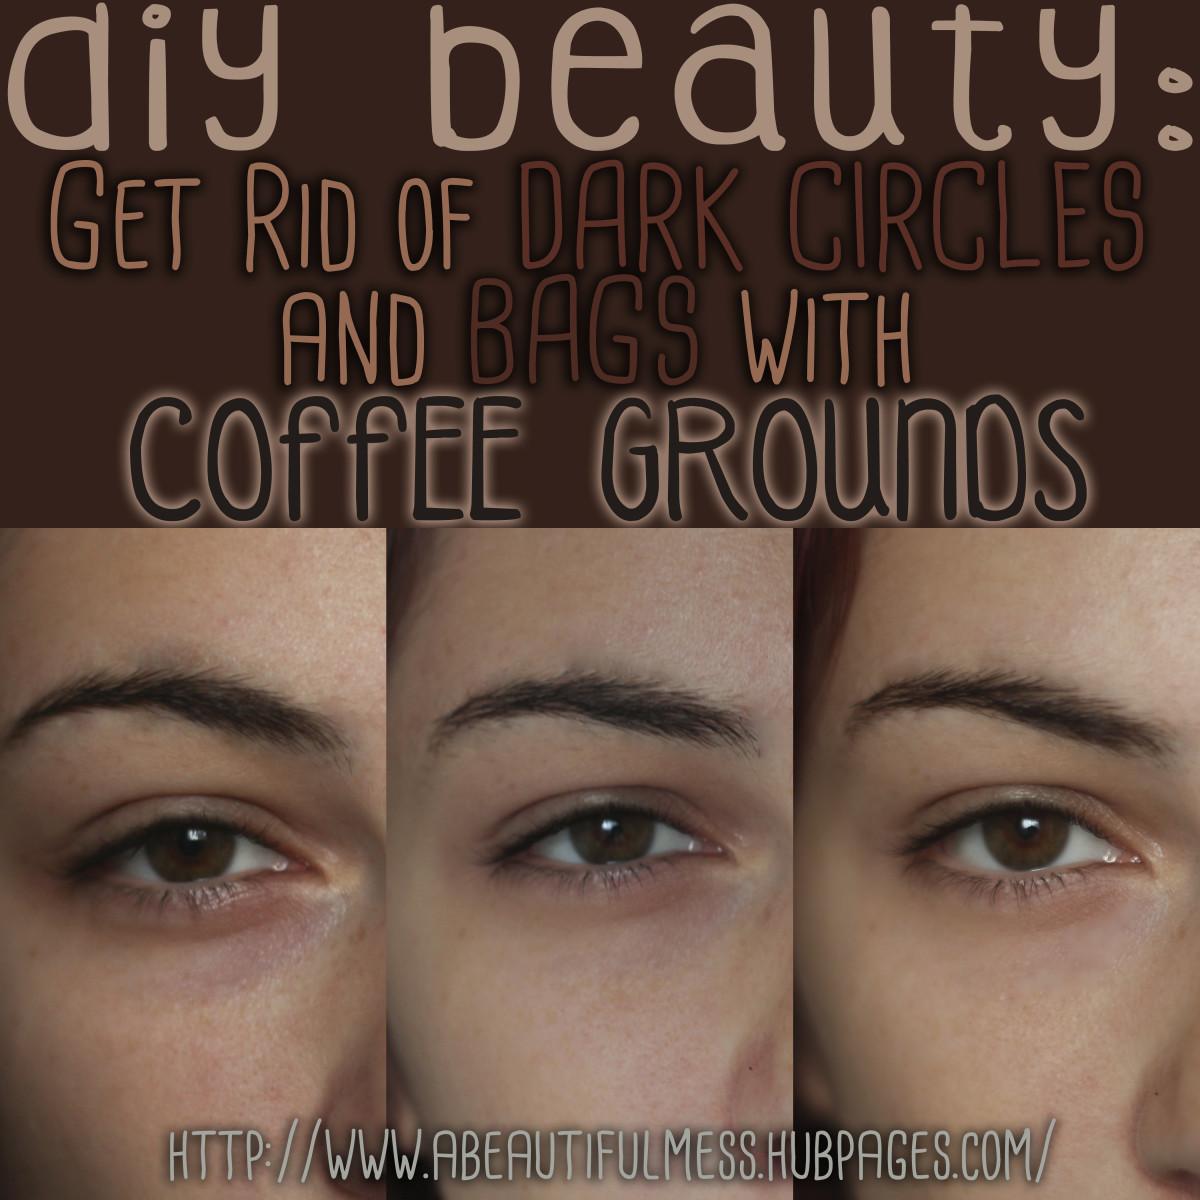 DIY Beauty Get Rid of Undereye Bags Dark Circles with Coffee